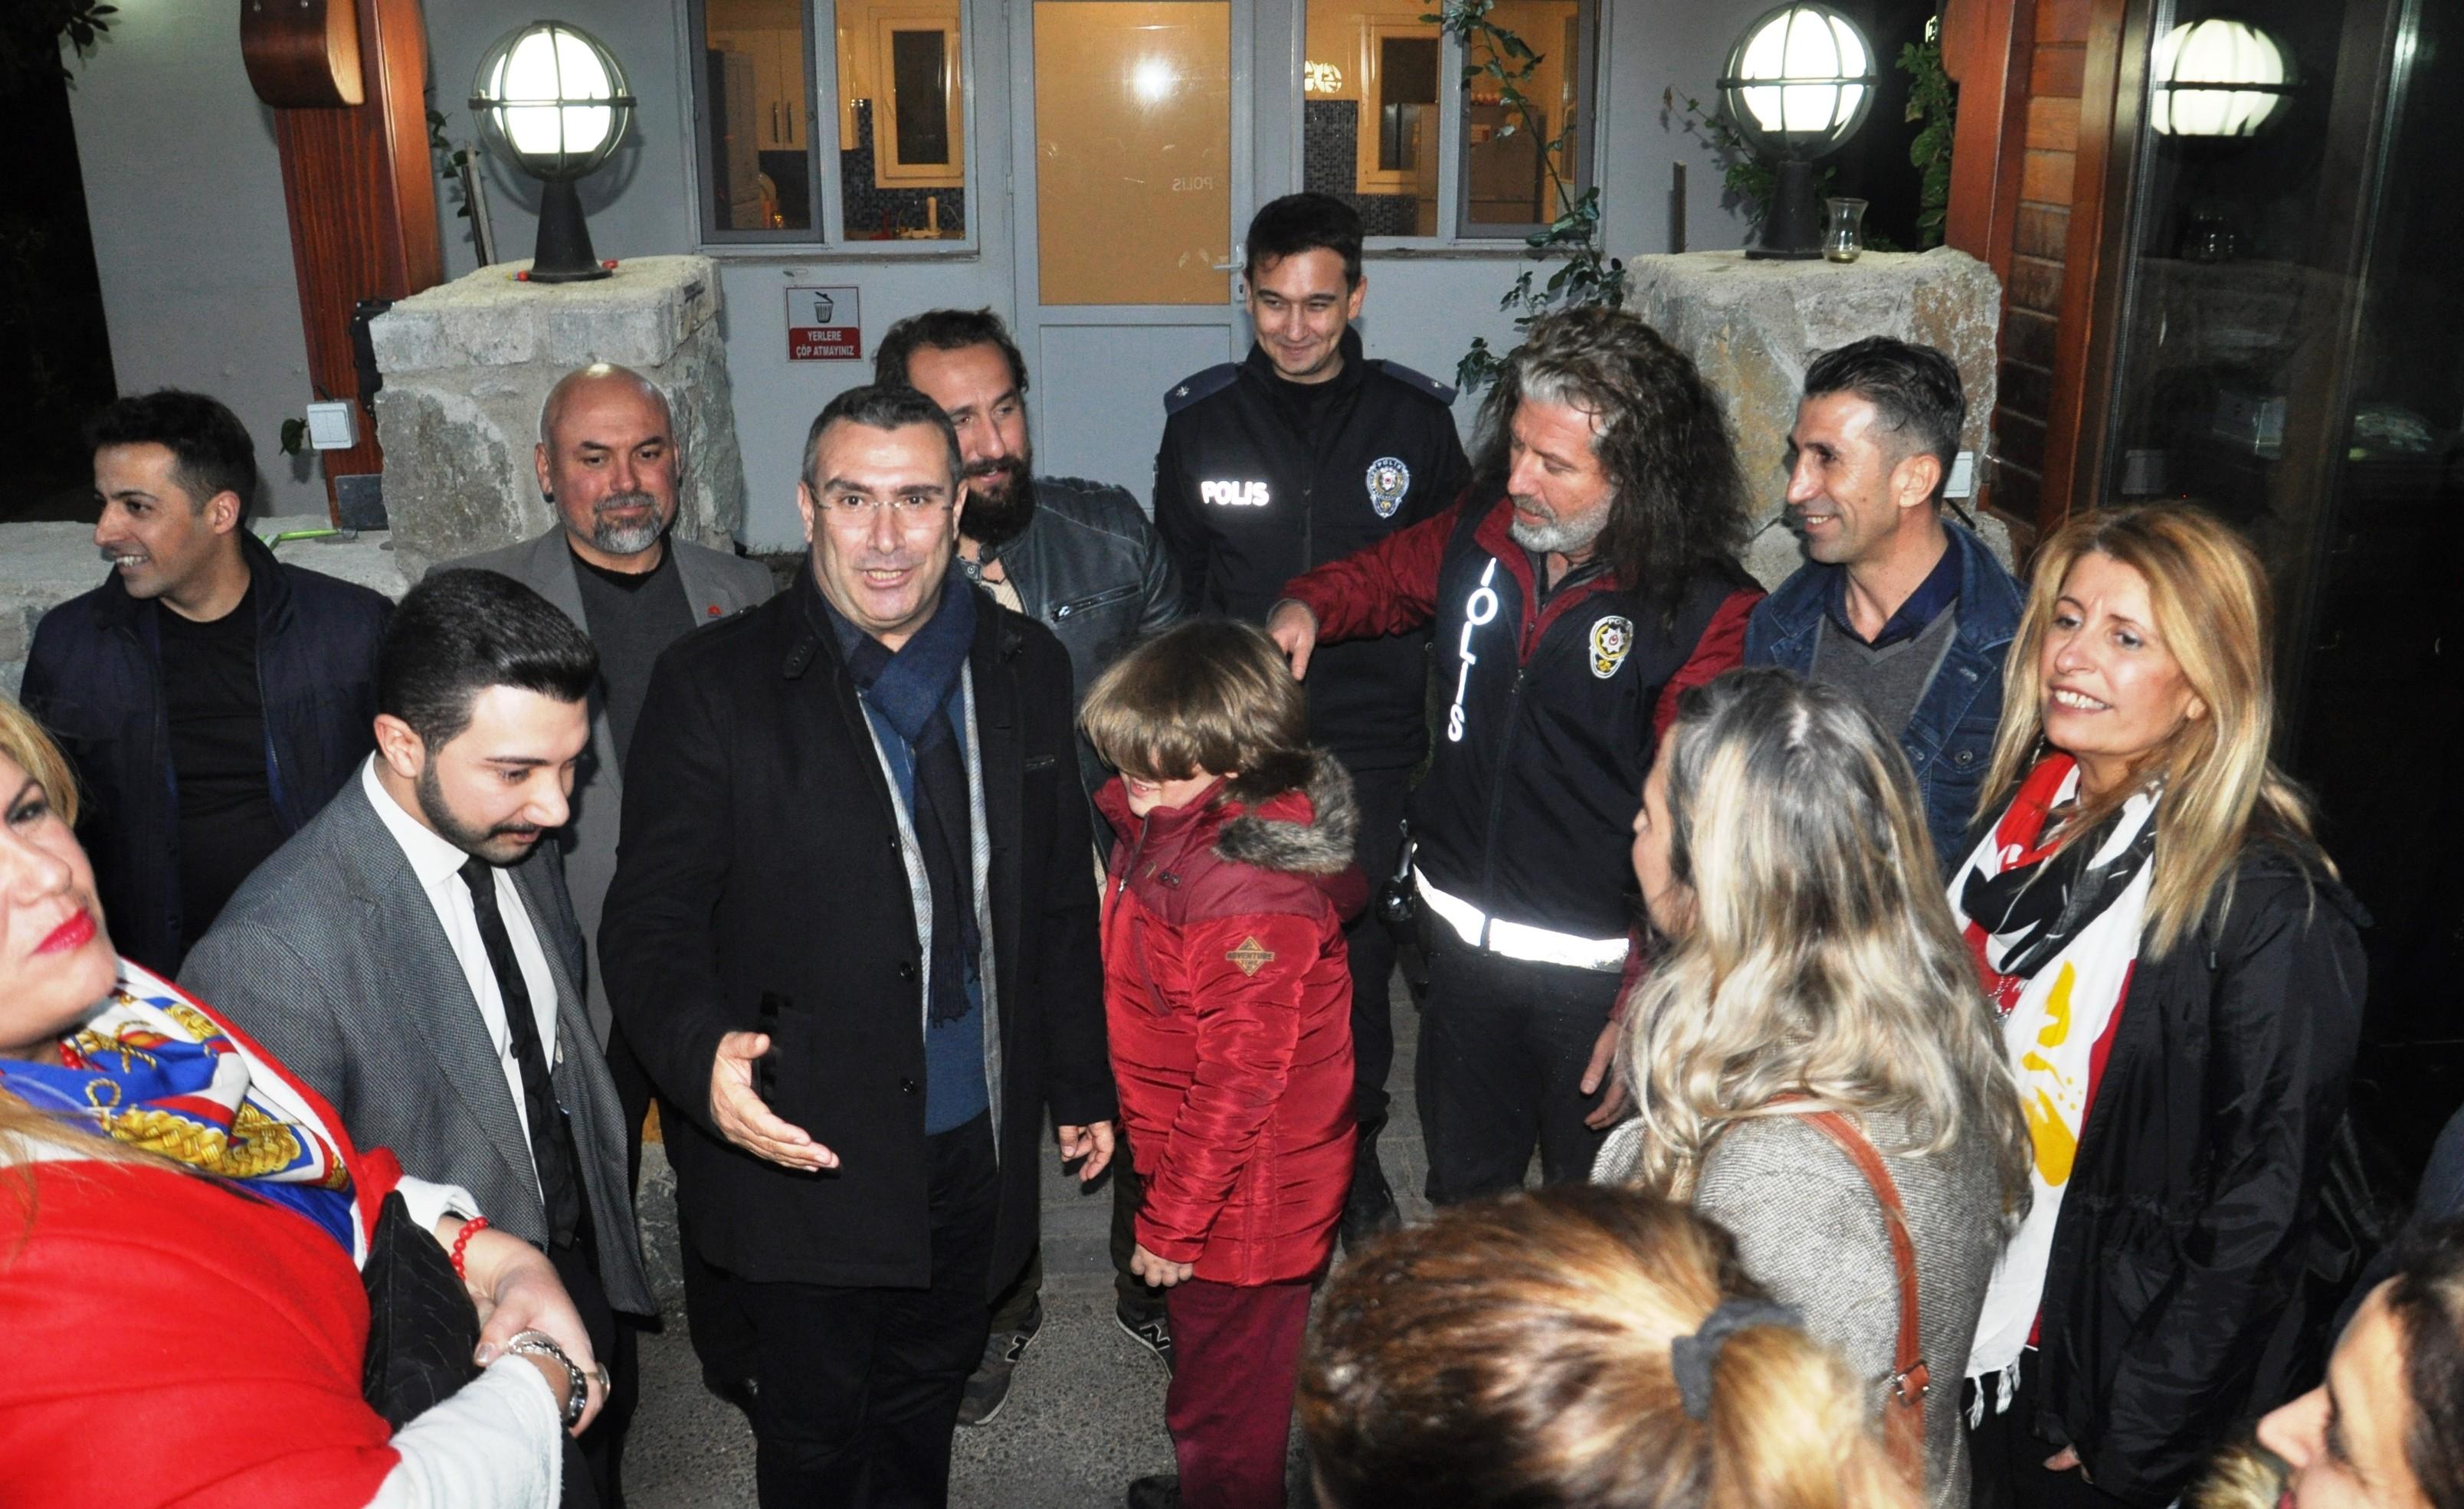 ak parti bodrum AK PARTİ BODRUM, YENİ YILA EMNİYET MENSUPLARIYLA BİRLİKTE GİRDİ…. ak parti yeni yil haber kutlama haber 3